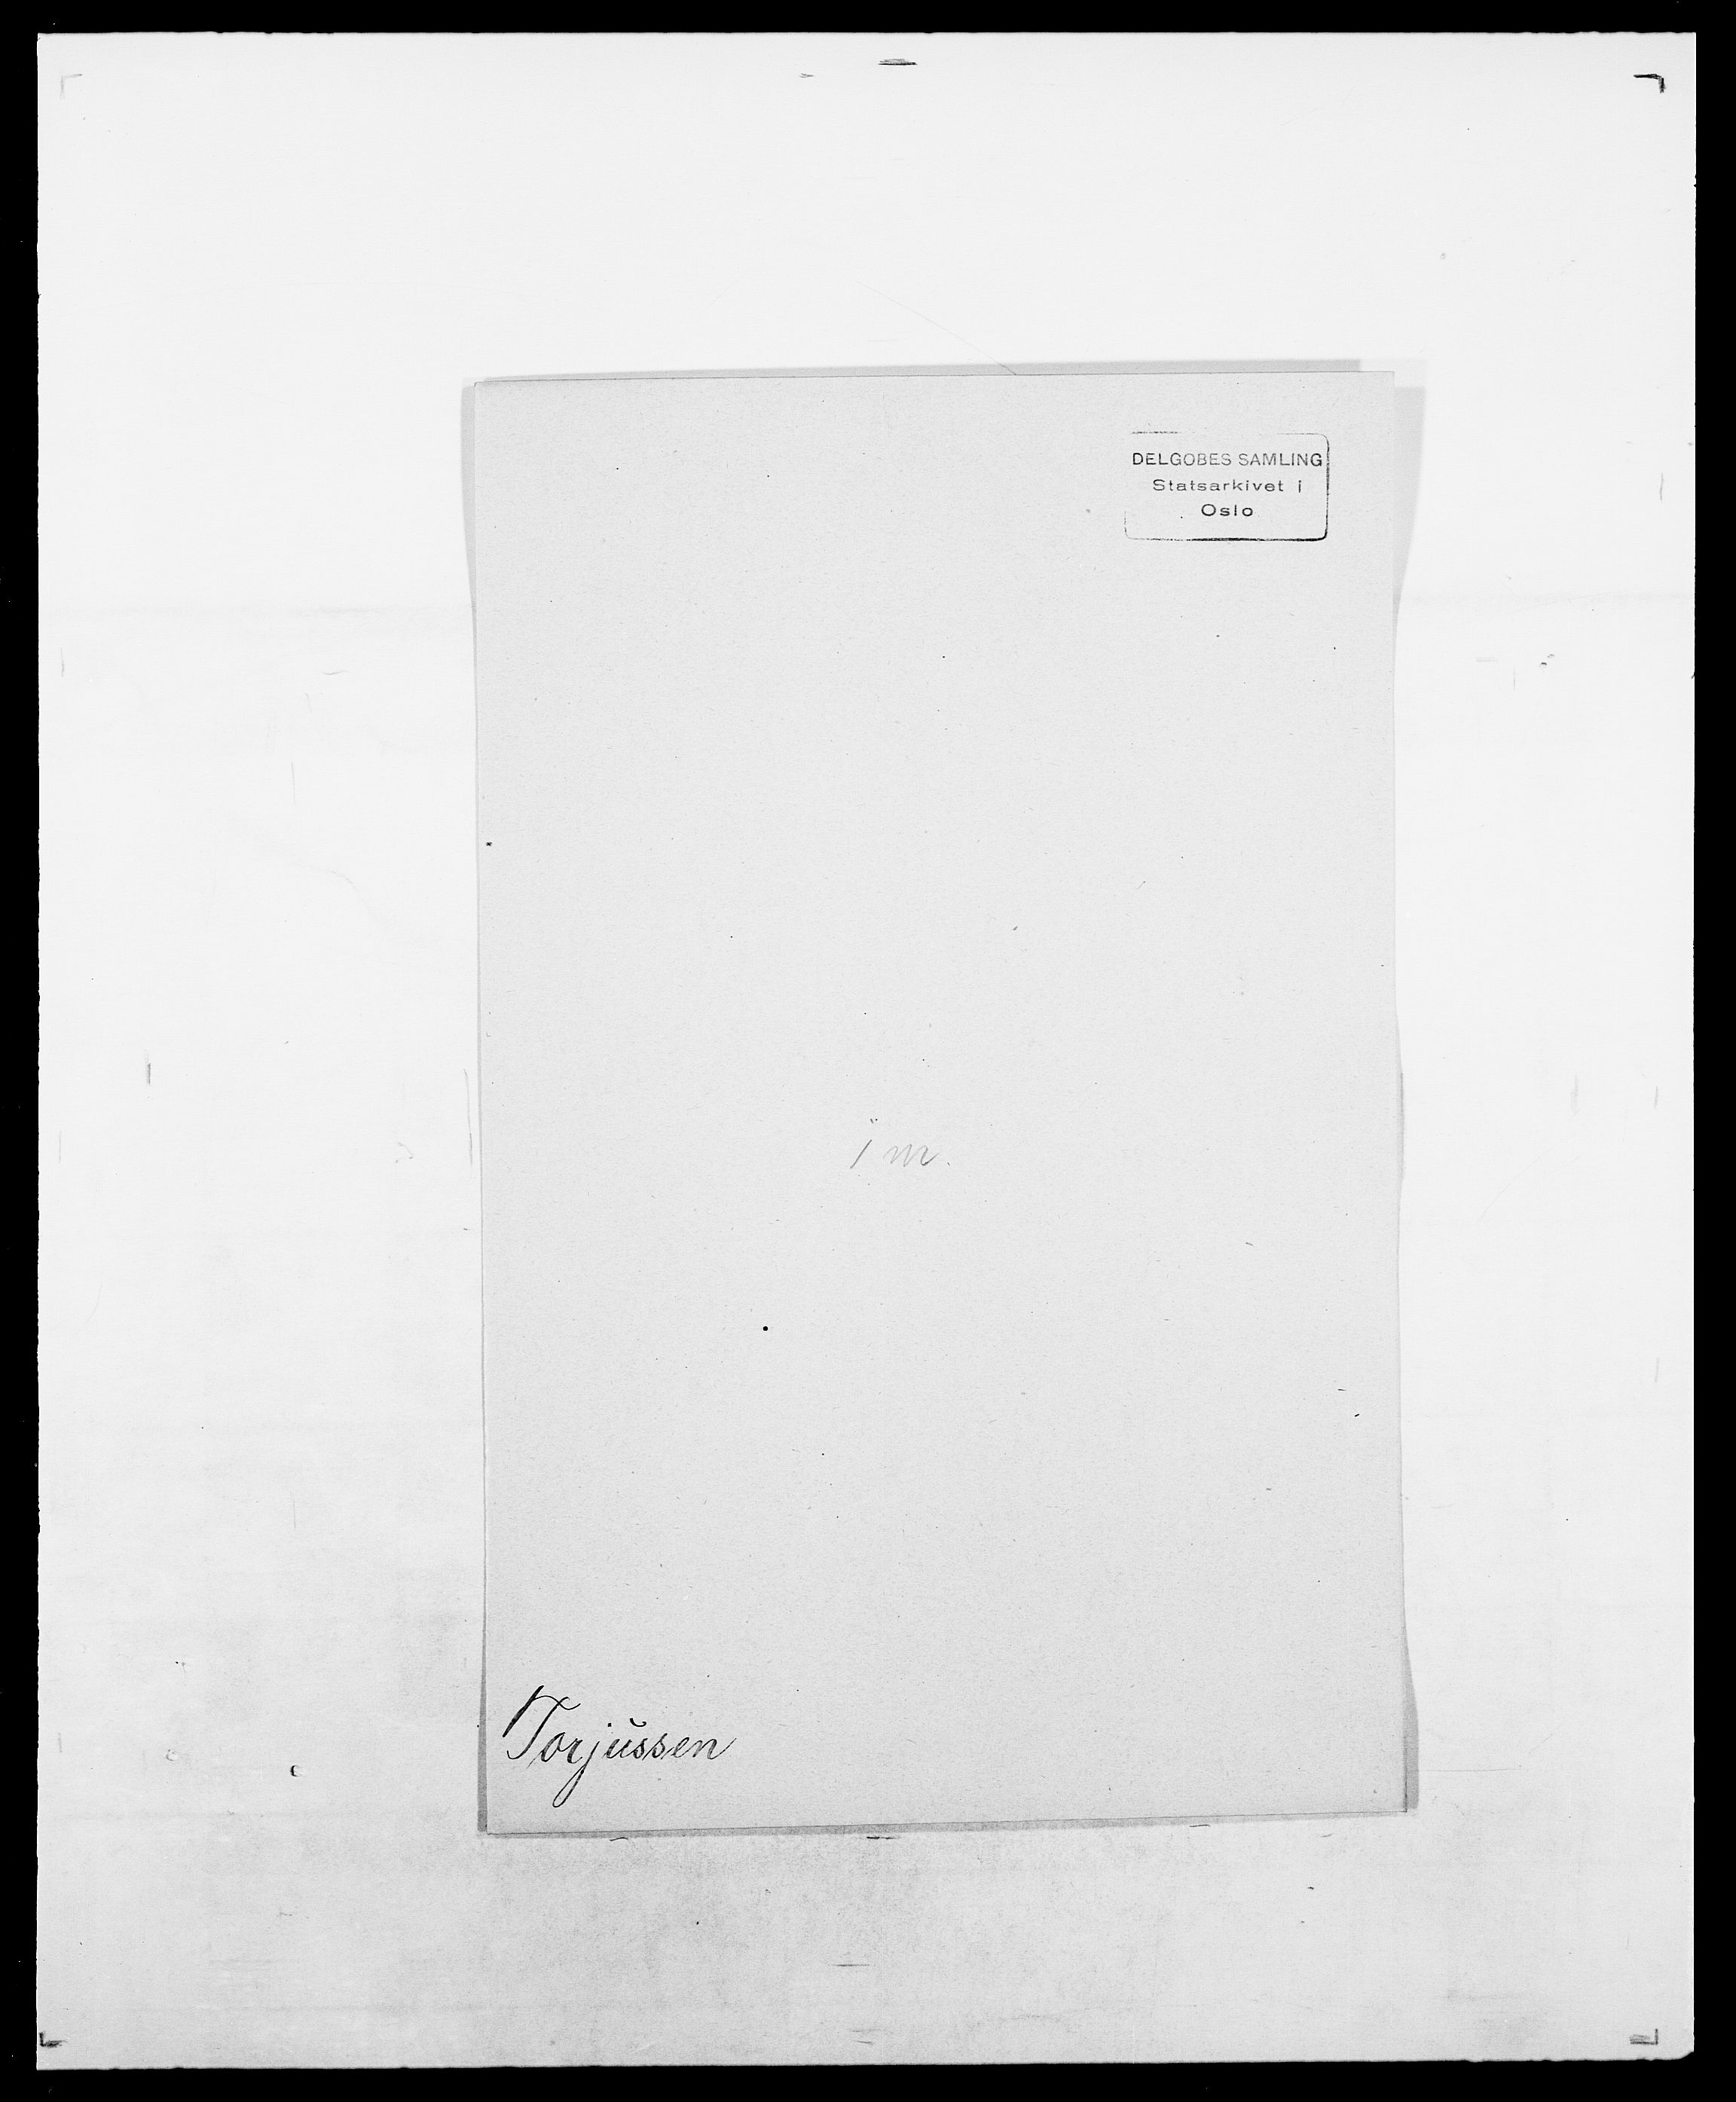 SAO, Delgobe, Charles Antoine - samling, D/Da/L0039: Thorsen - Urup, s. 172